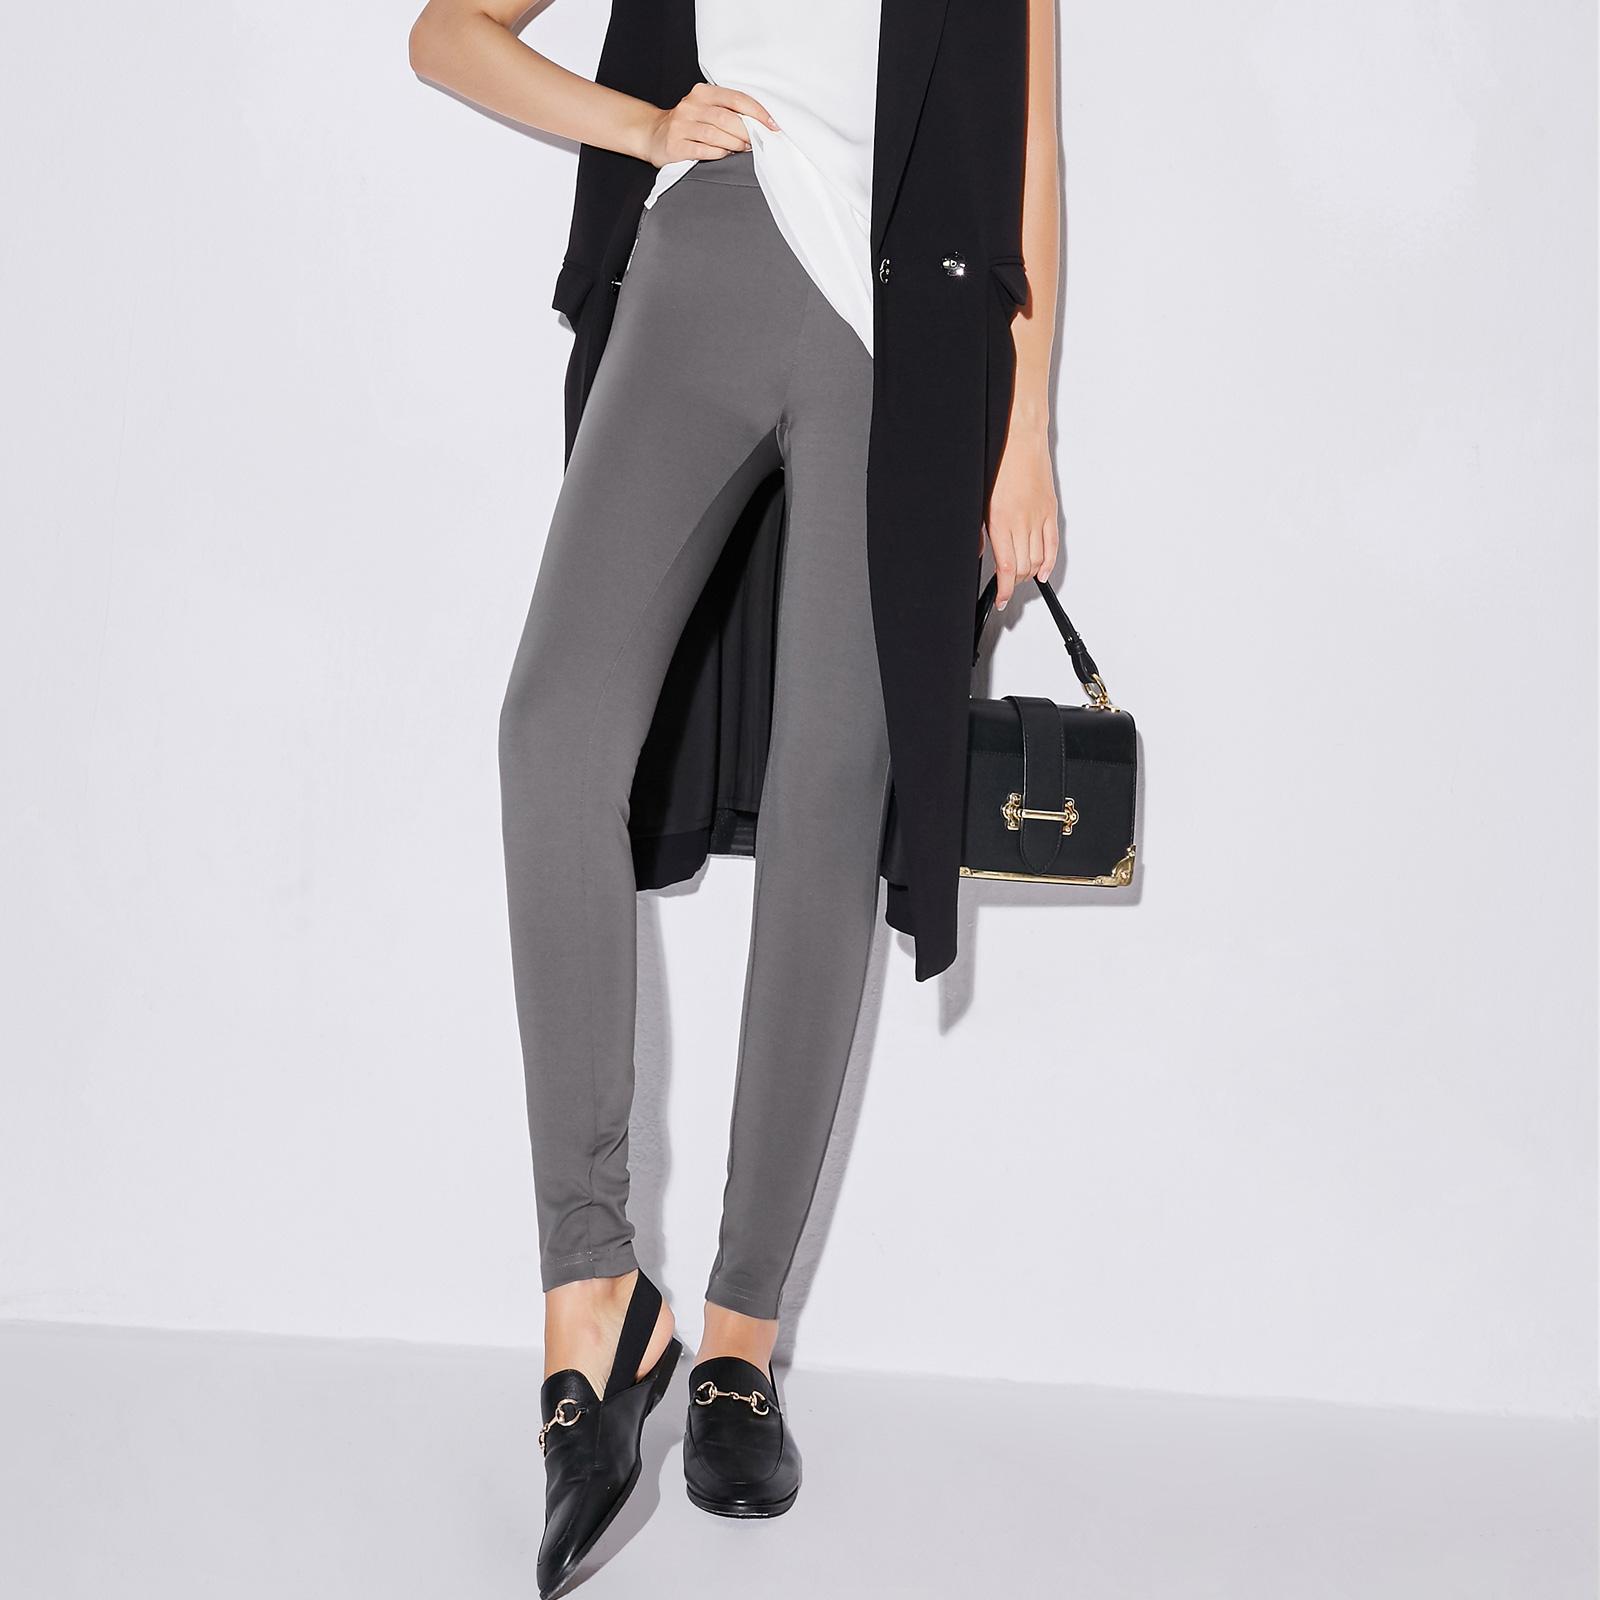 Korea Fashion Style Keelastikan Baru Legging Celana Panjang Legging (Hitam (langkah kaki)-